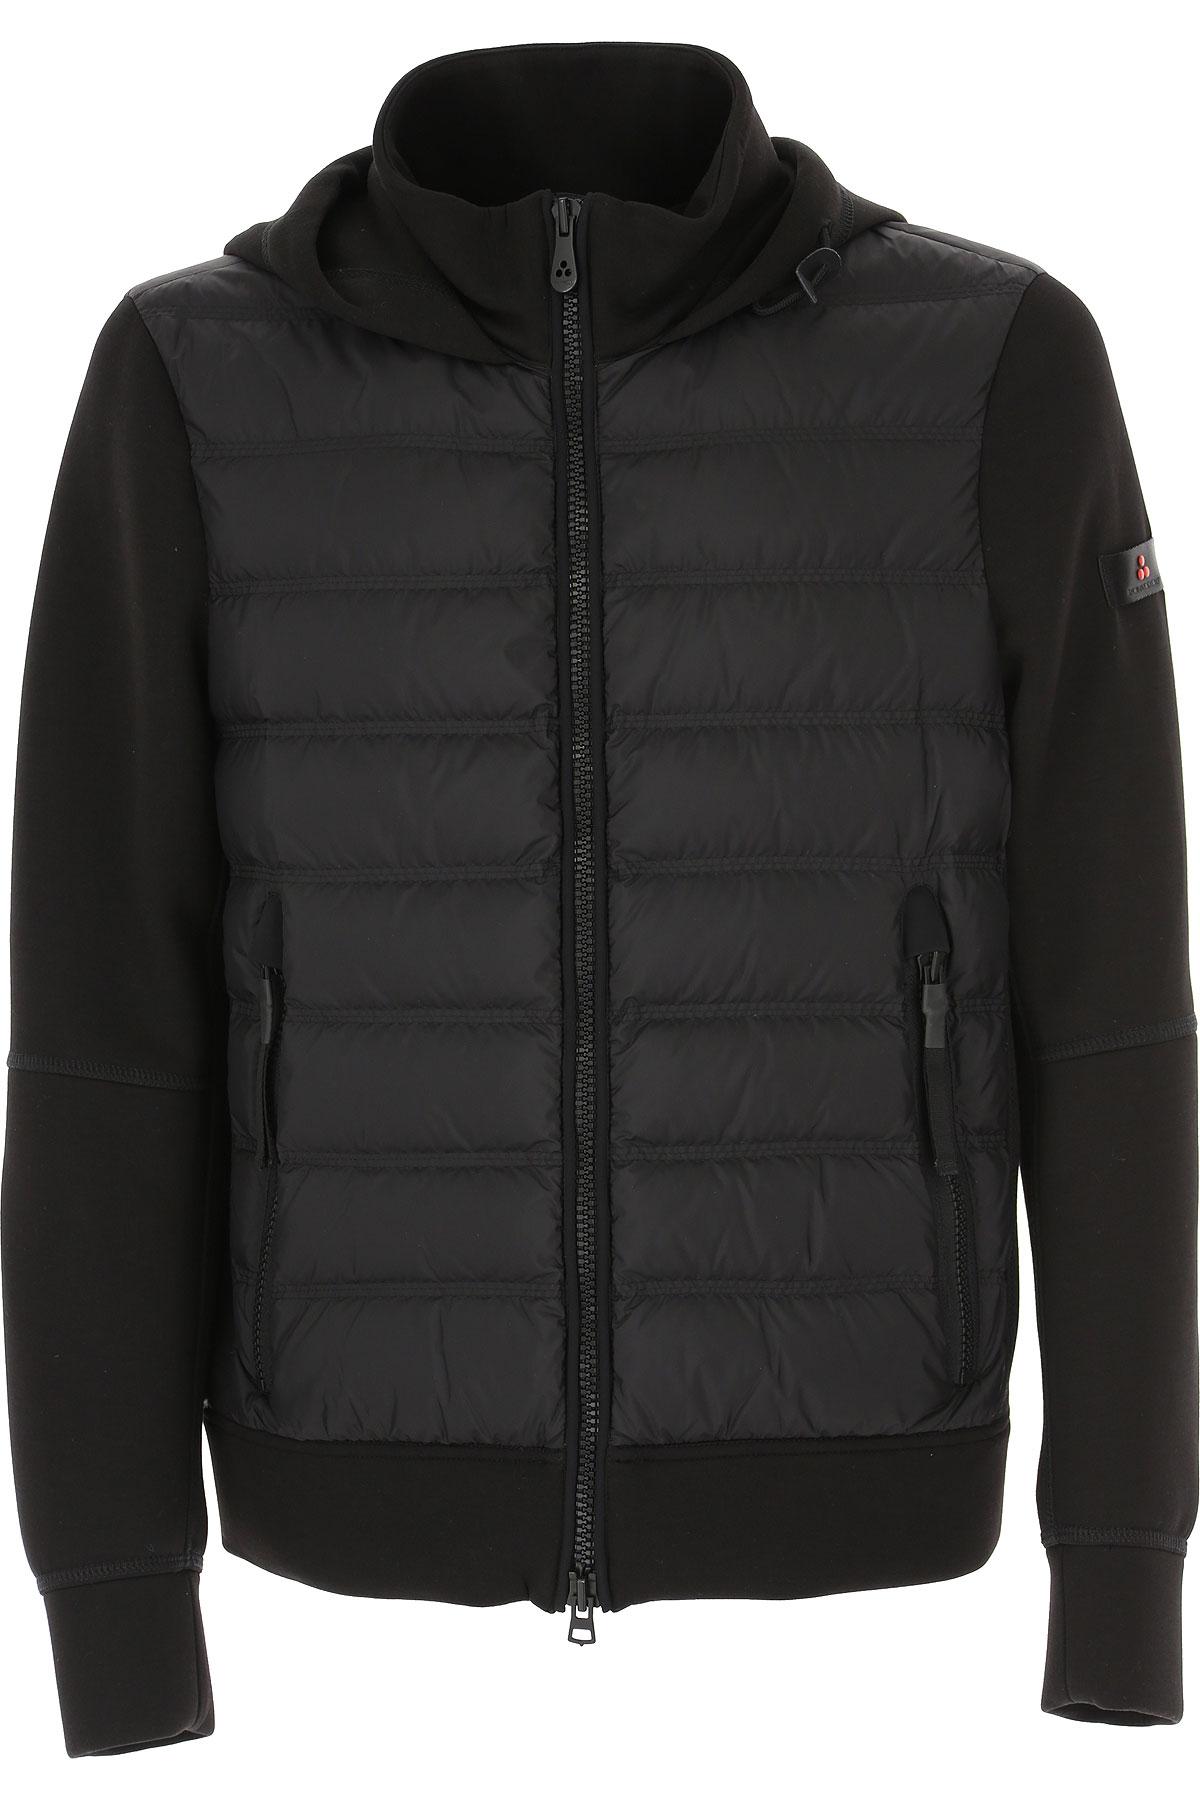 Peuterey Down Jacket for Men, Puffer Ski Jacket On Sale, Black, Down, 2019, L M S XL XXL